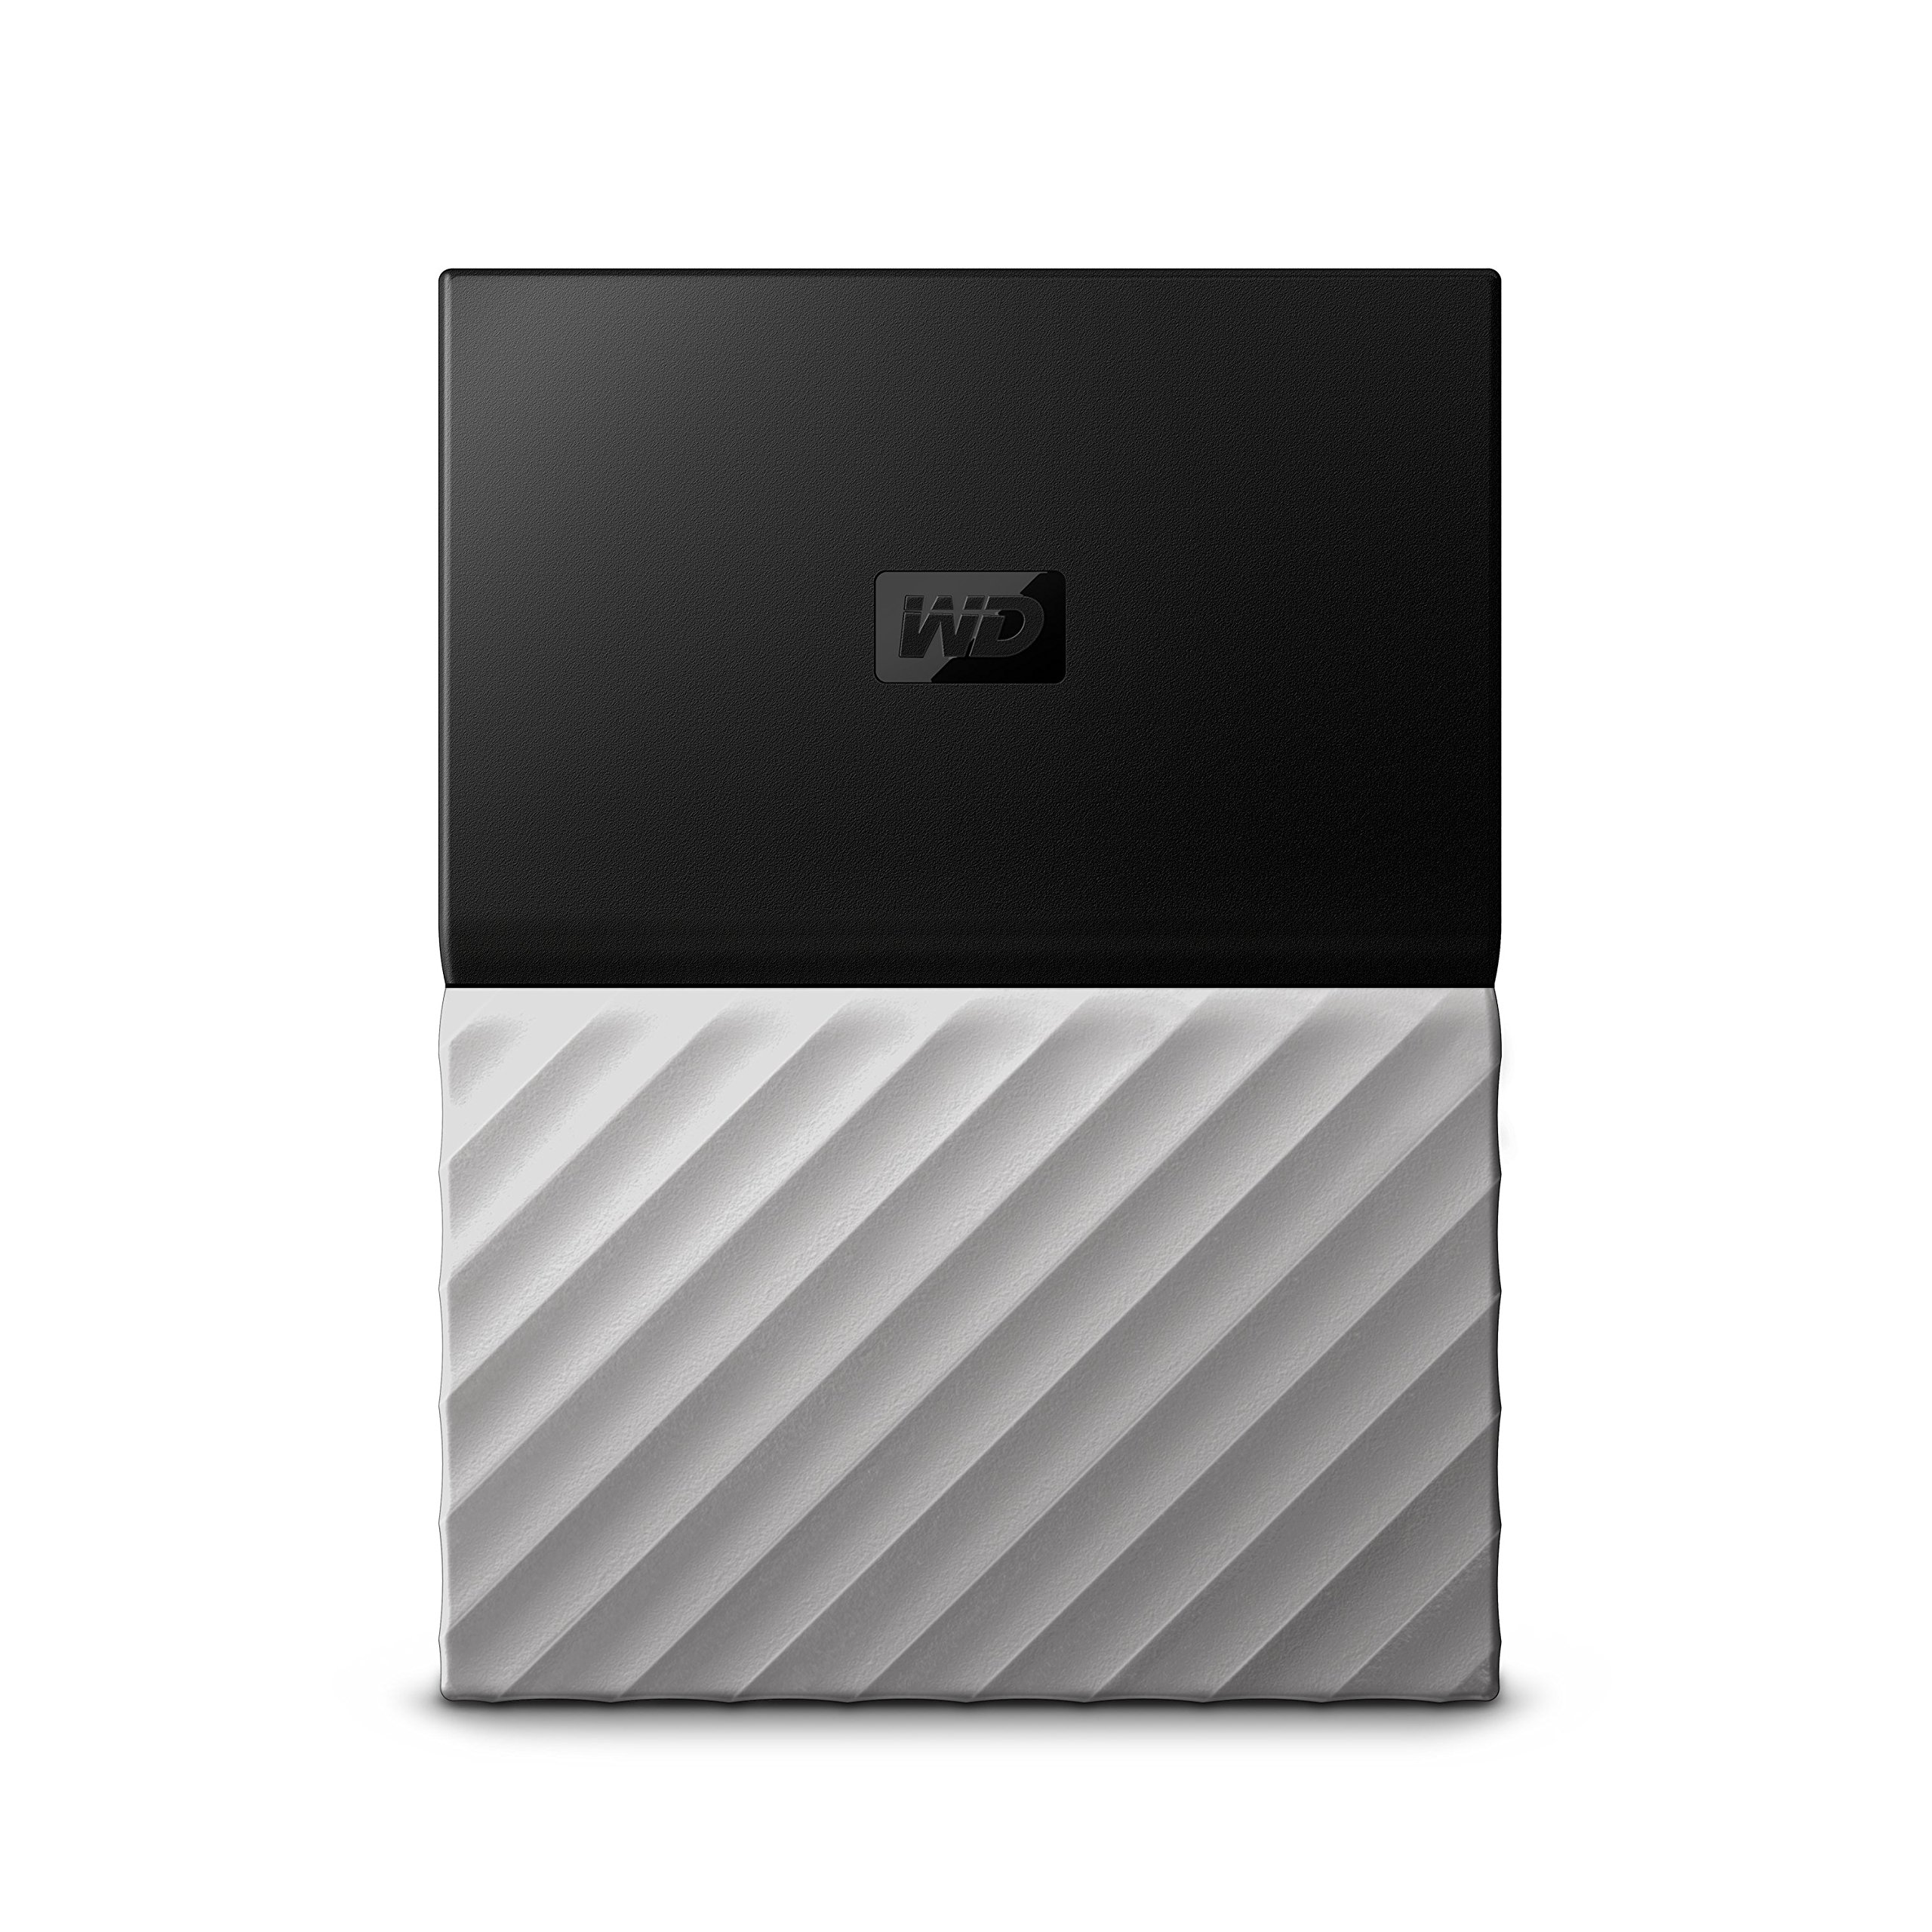 WD 1TB Black-Gray My Passport Ultra Portable External Hard Drive - USB 3.0 - WDBTLG0010BGY-WESN